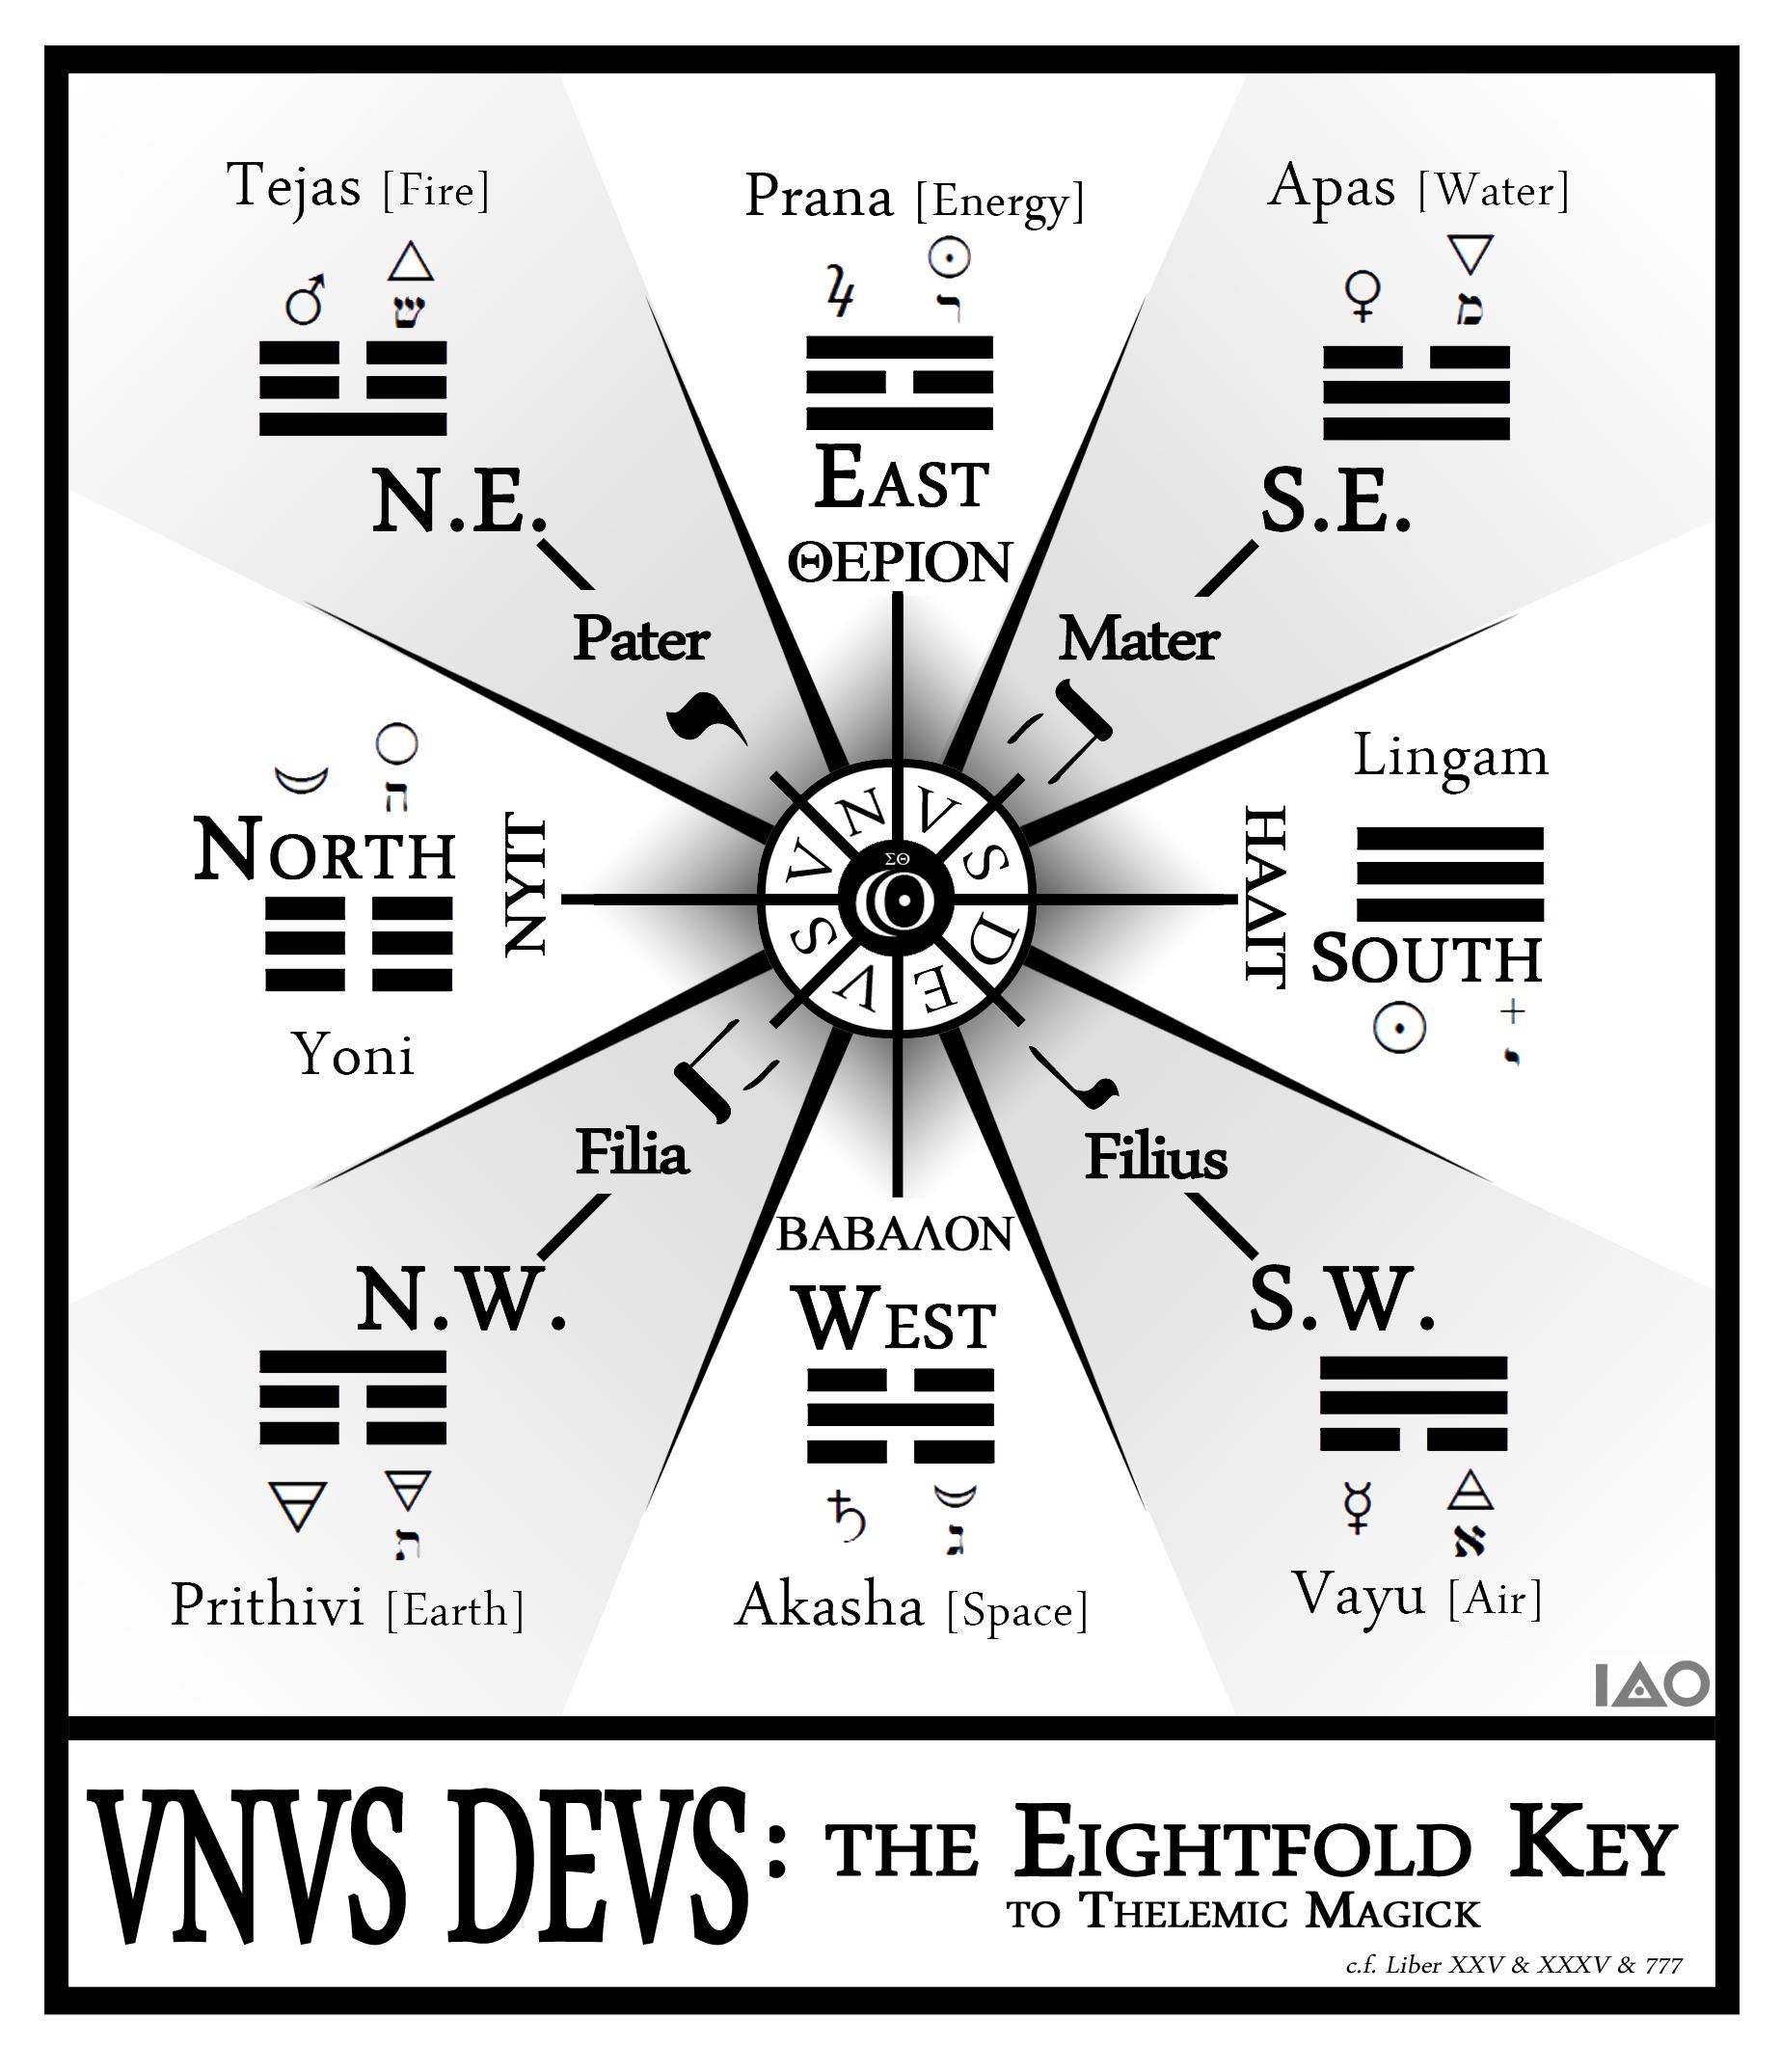 Unus deus the eightfold key to thelemic magick iao131 unus deus the eightfold key to thelemic magick do what biocorpaavc